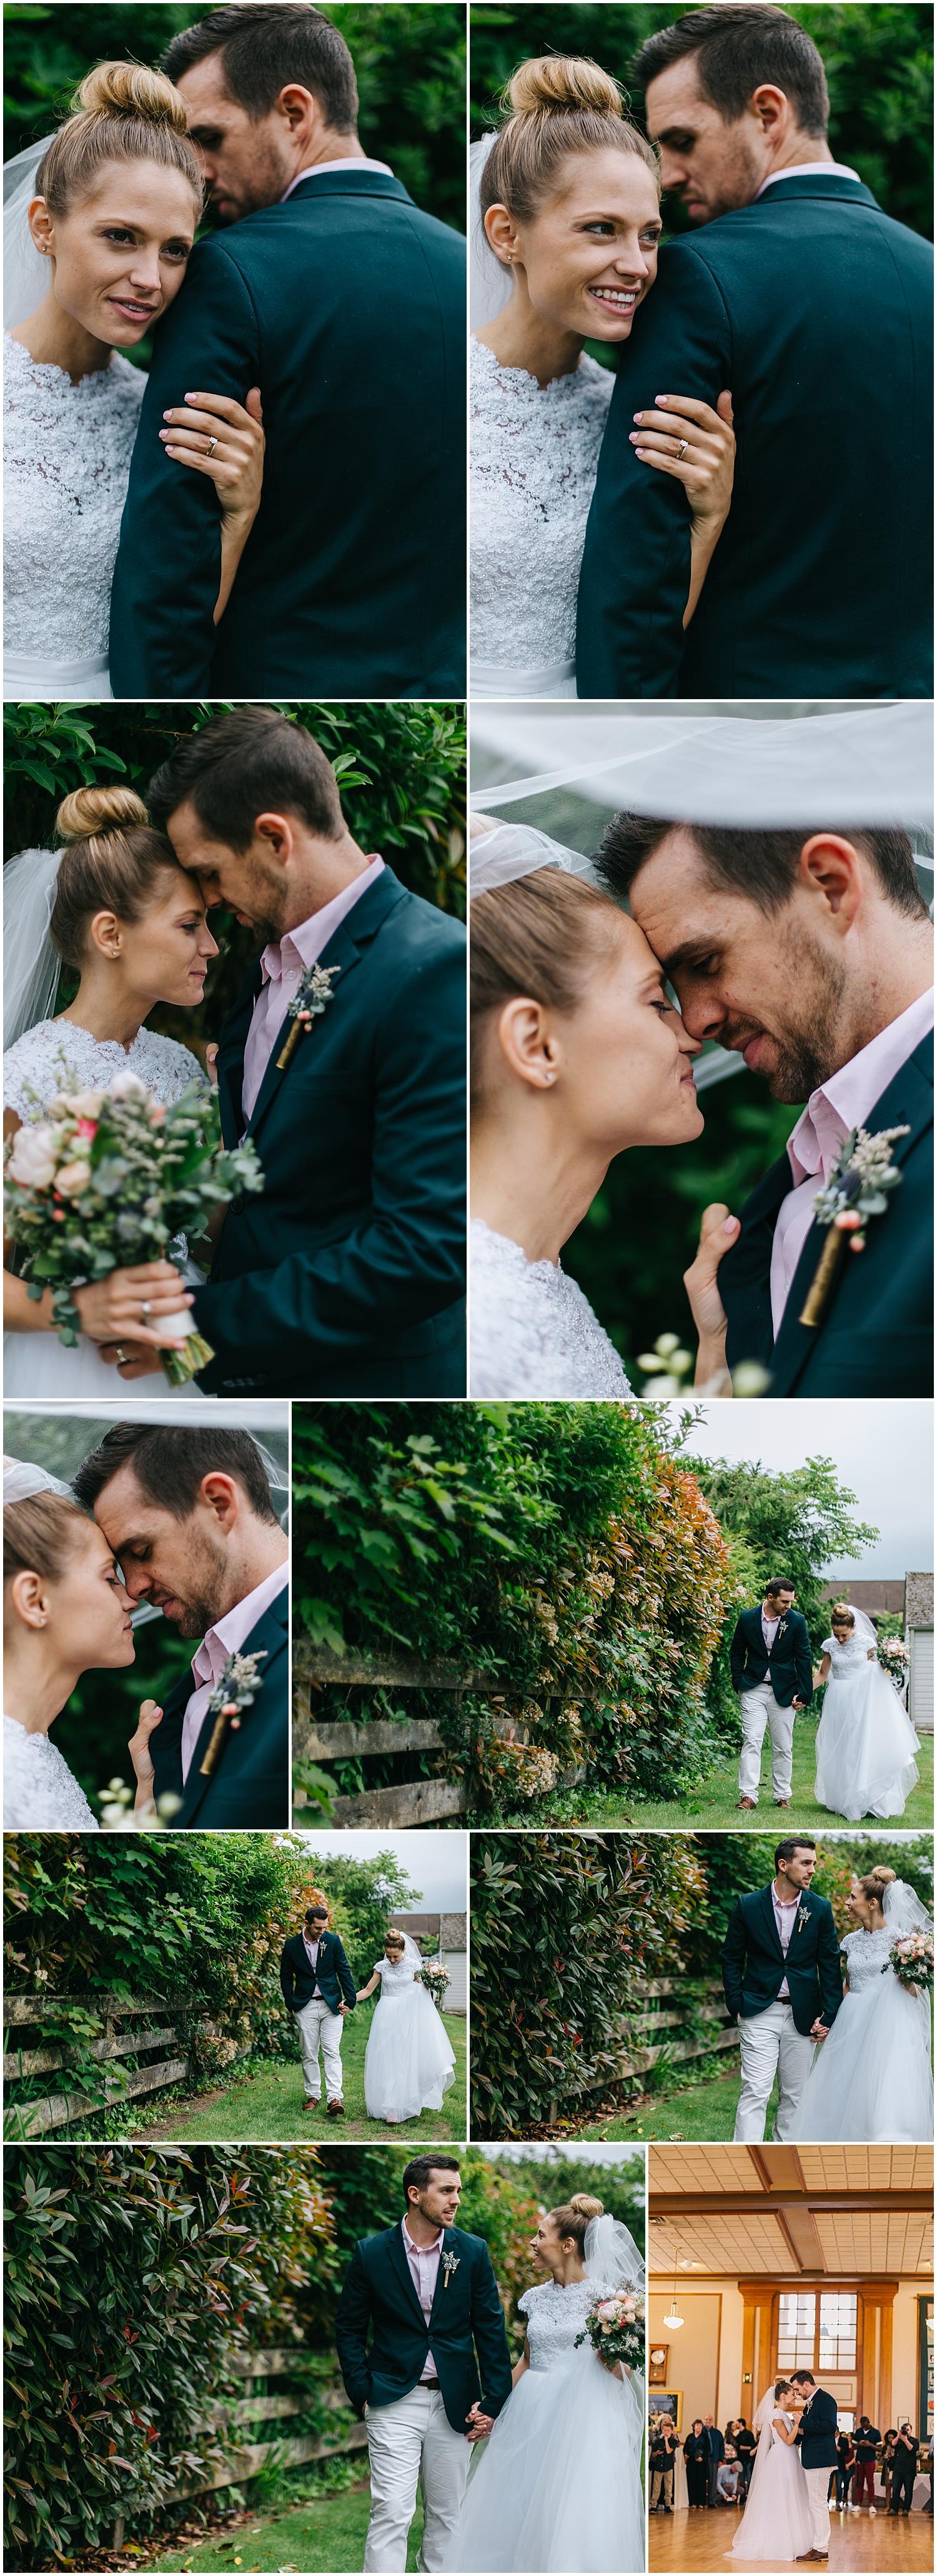 Stocking-Wedding-00006.jpg